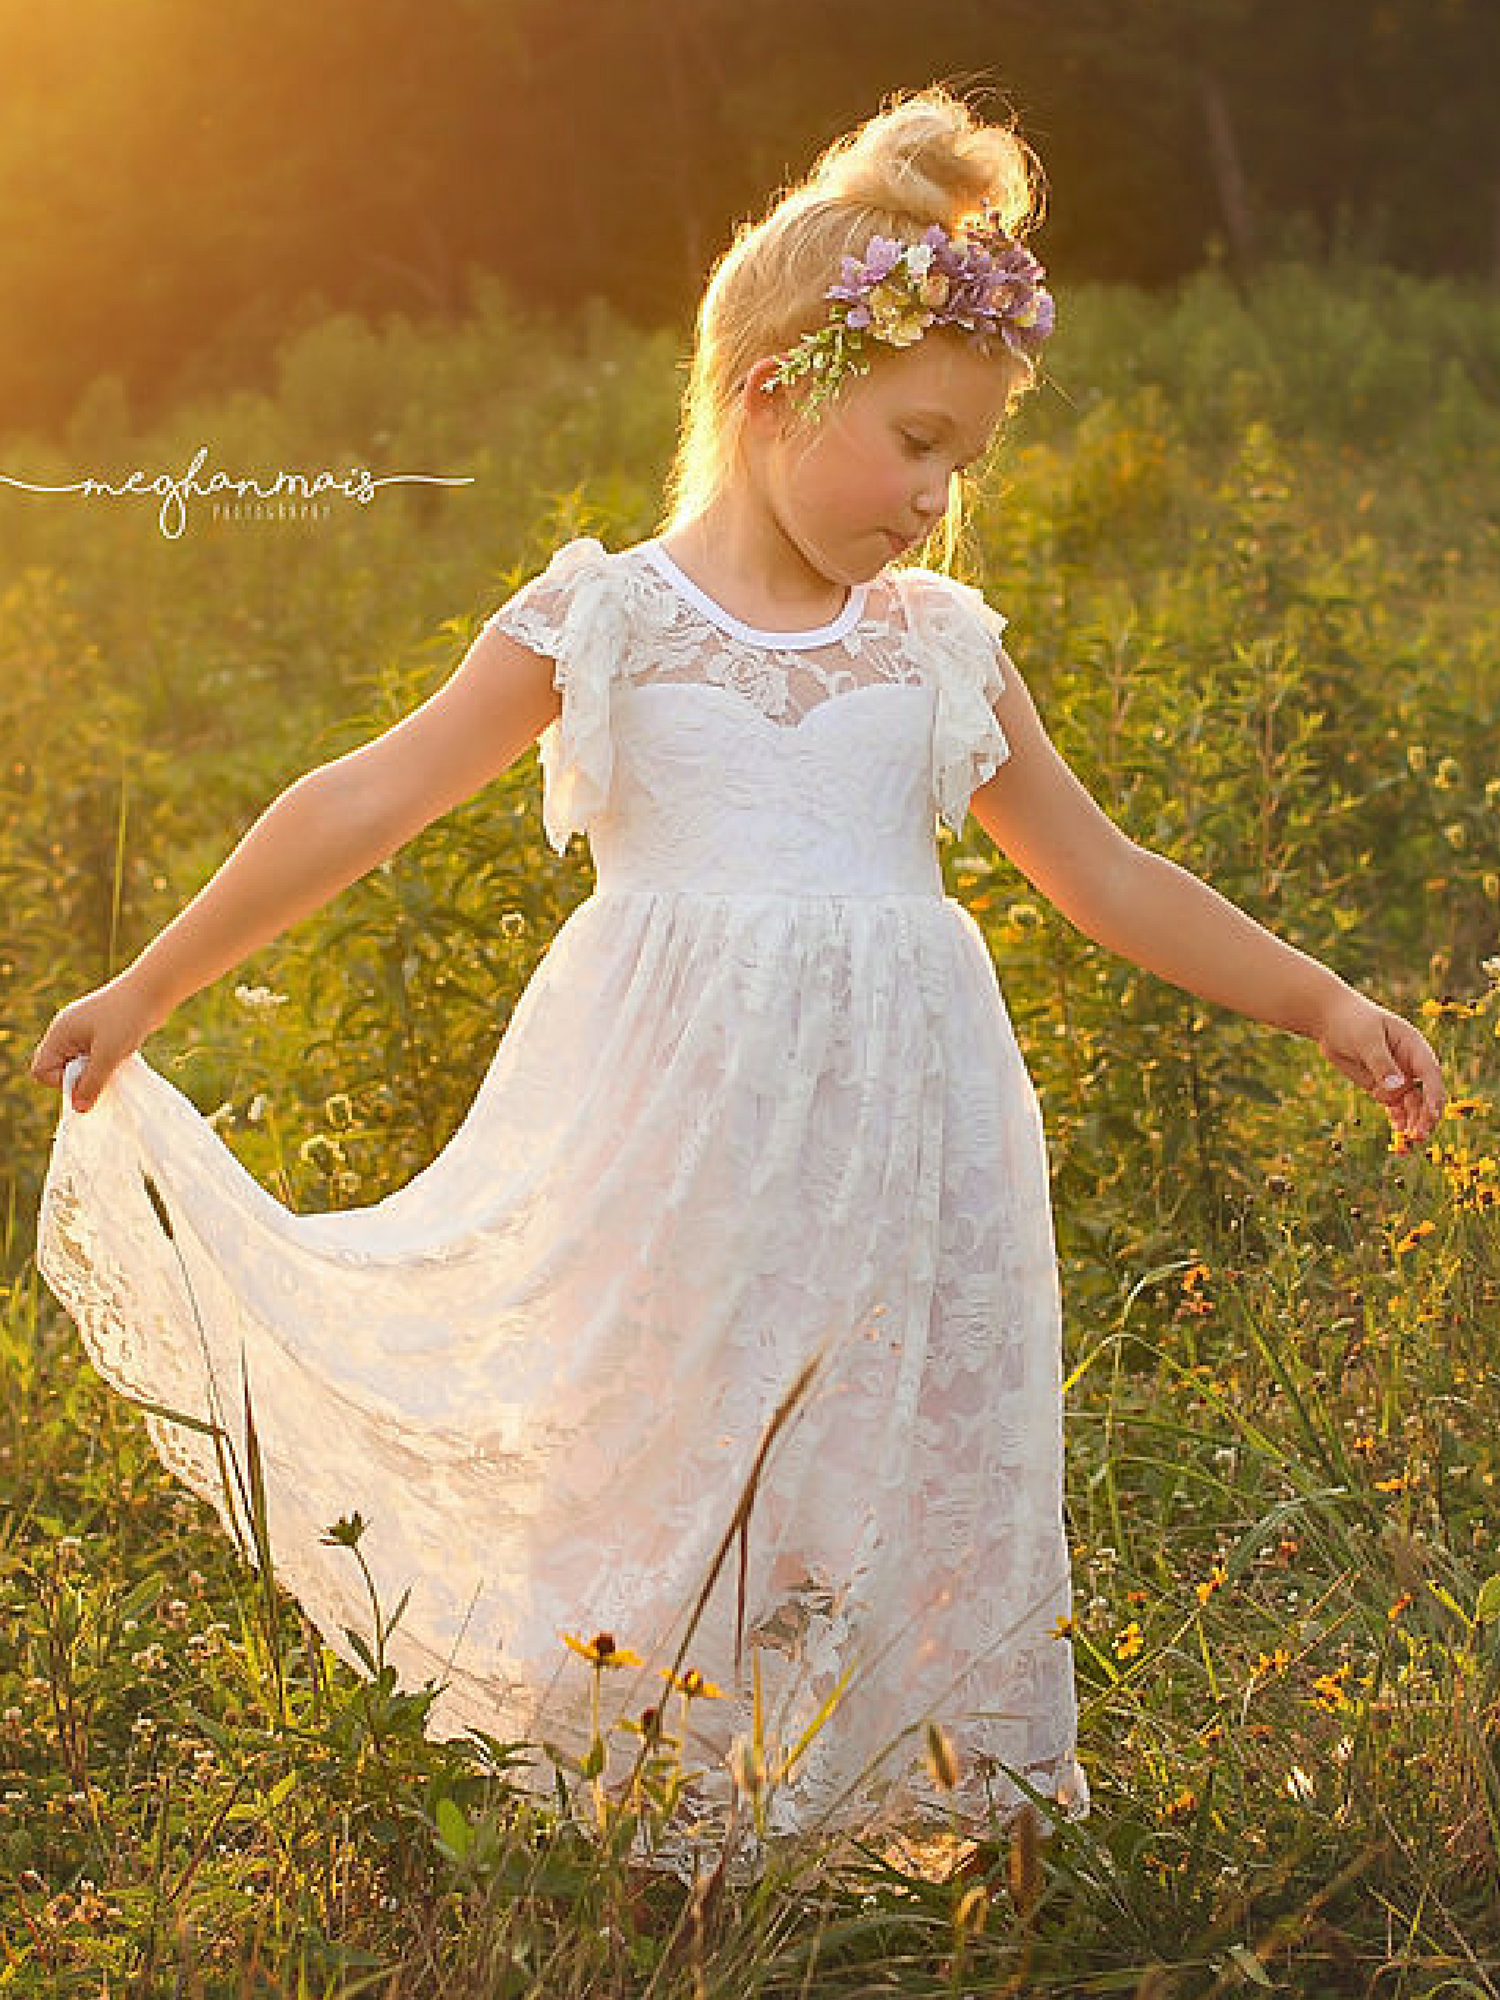 ad512015f8b6 White Lace Sweetheart Neckline Flower Girl Dress …